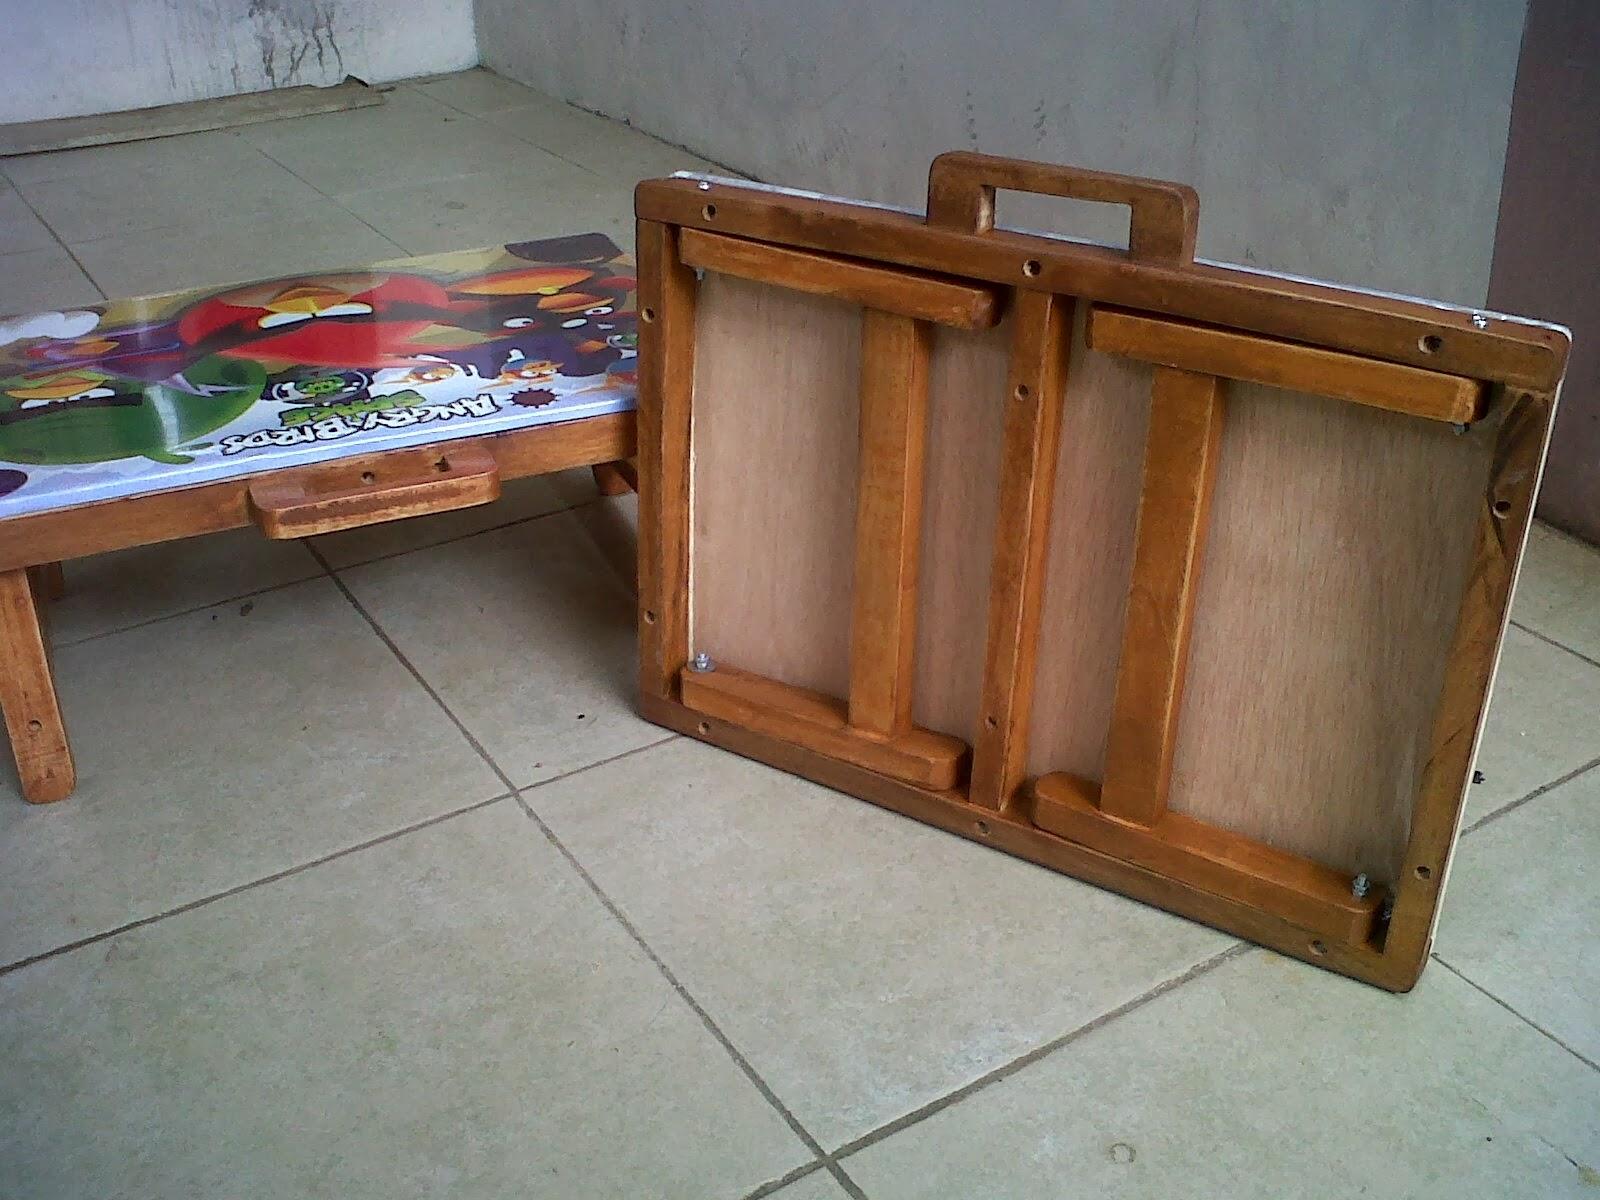 jual meja belajar lipat anak murah pusat grosir distributor rh nawwafhuda atk blogspot com cara membuat meja lipat sendiri cara membuat meja lipat dari besi siku